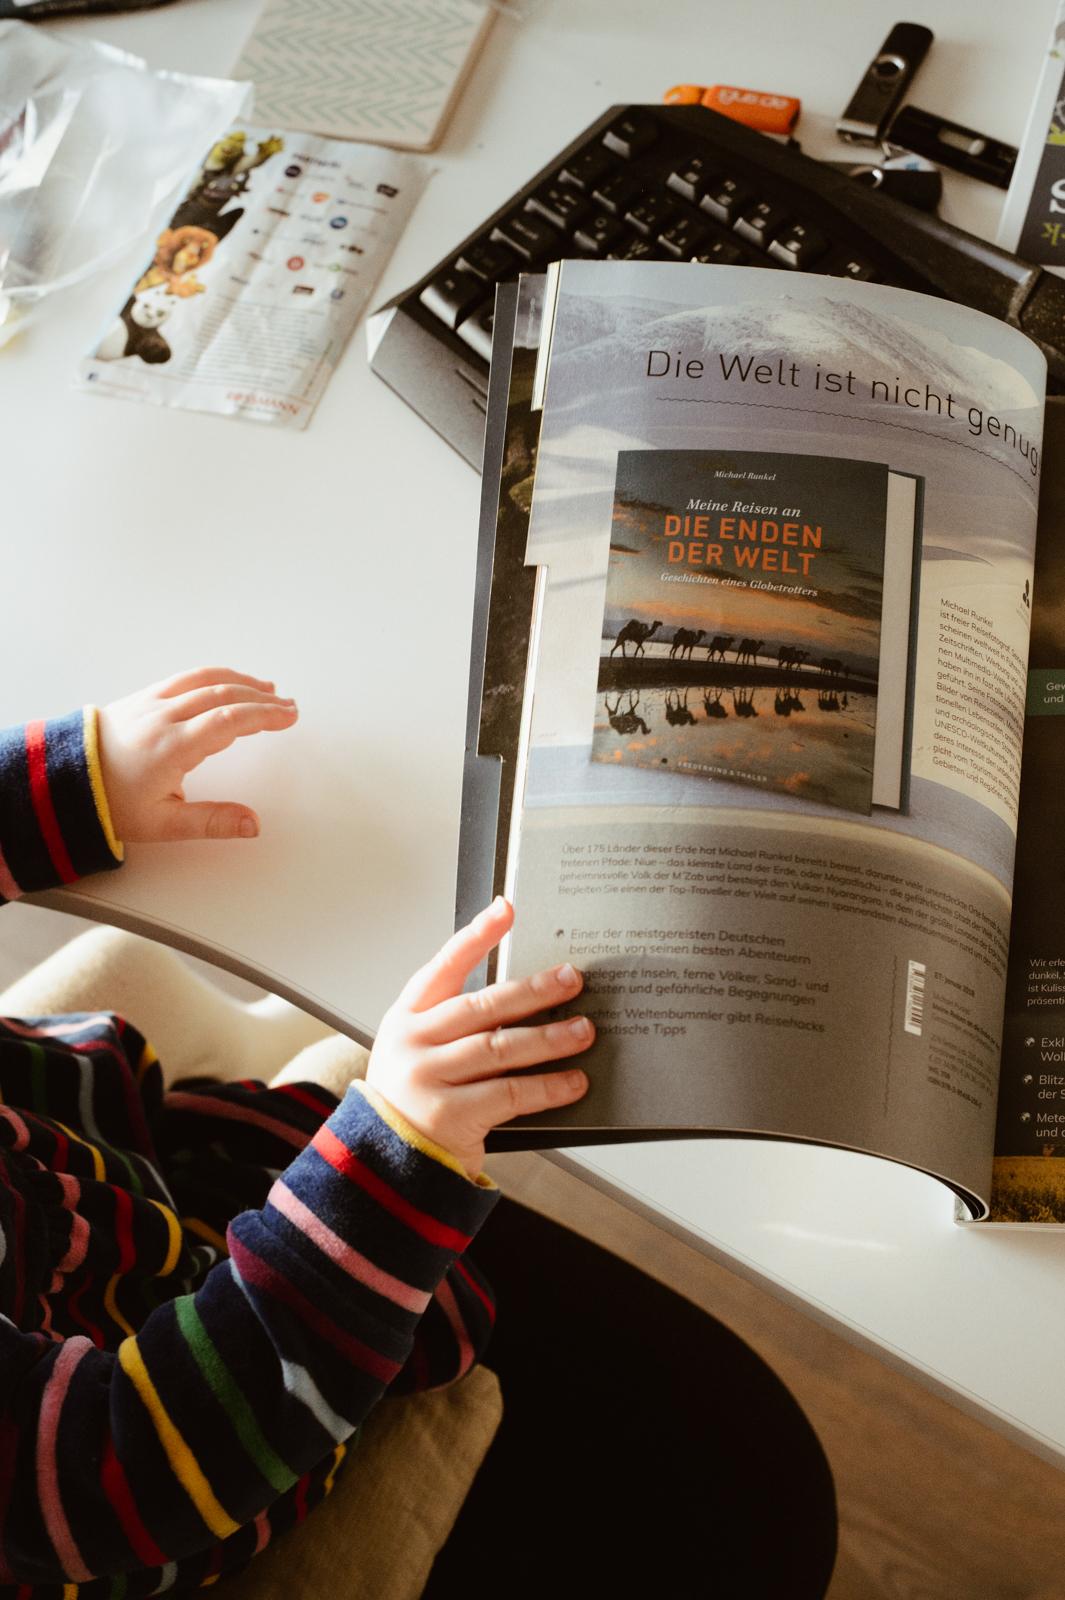 Frederking & Thaler Catalog 2018, Michel Runkel